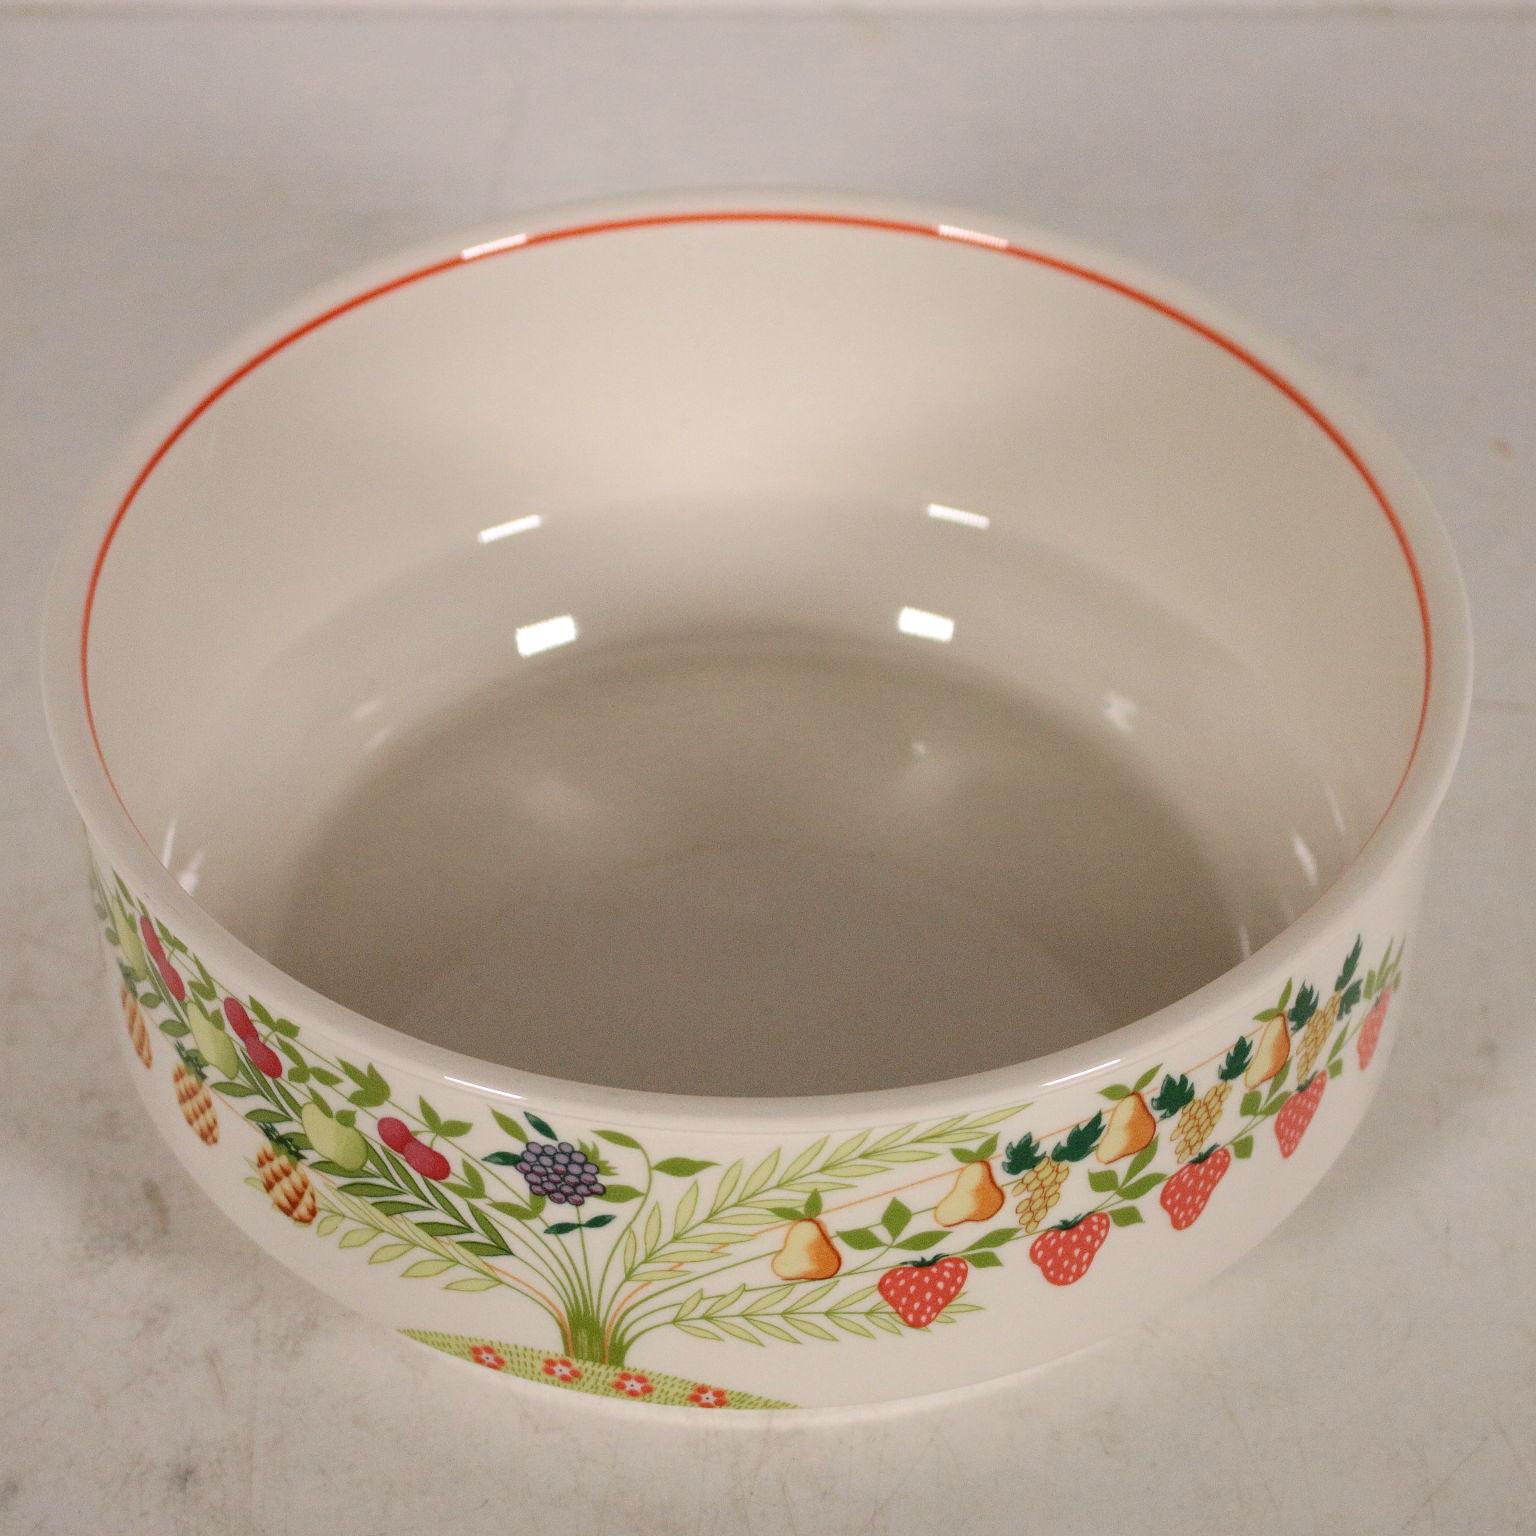 Villeroy E Boch Piatti.Porcelain Dinner Set By Villeroy Boch Germany 20th Century